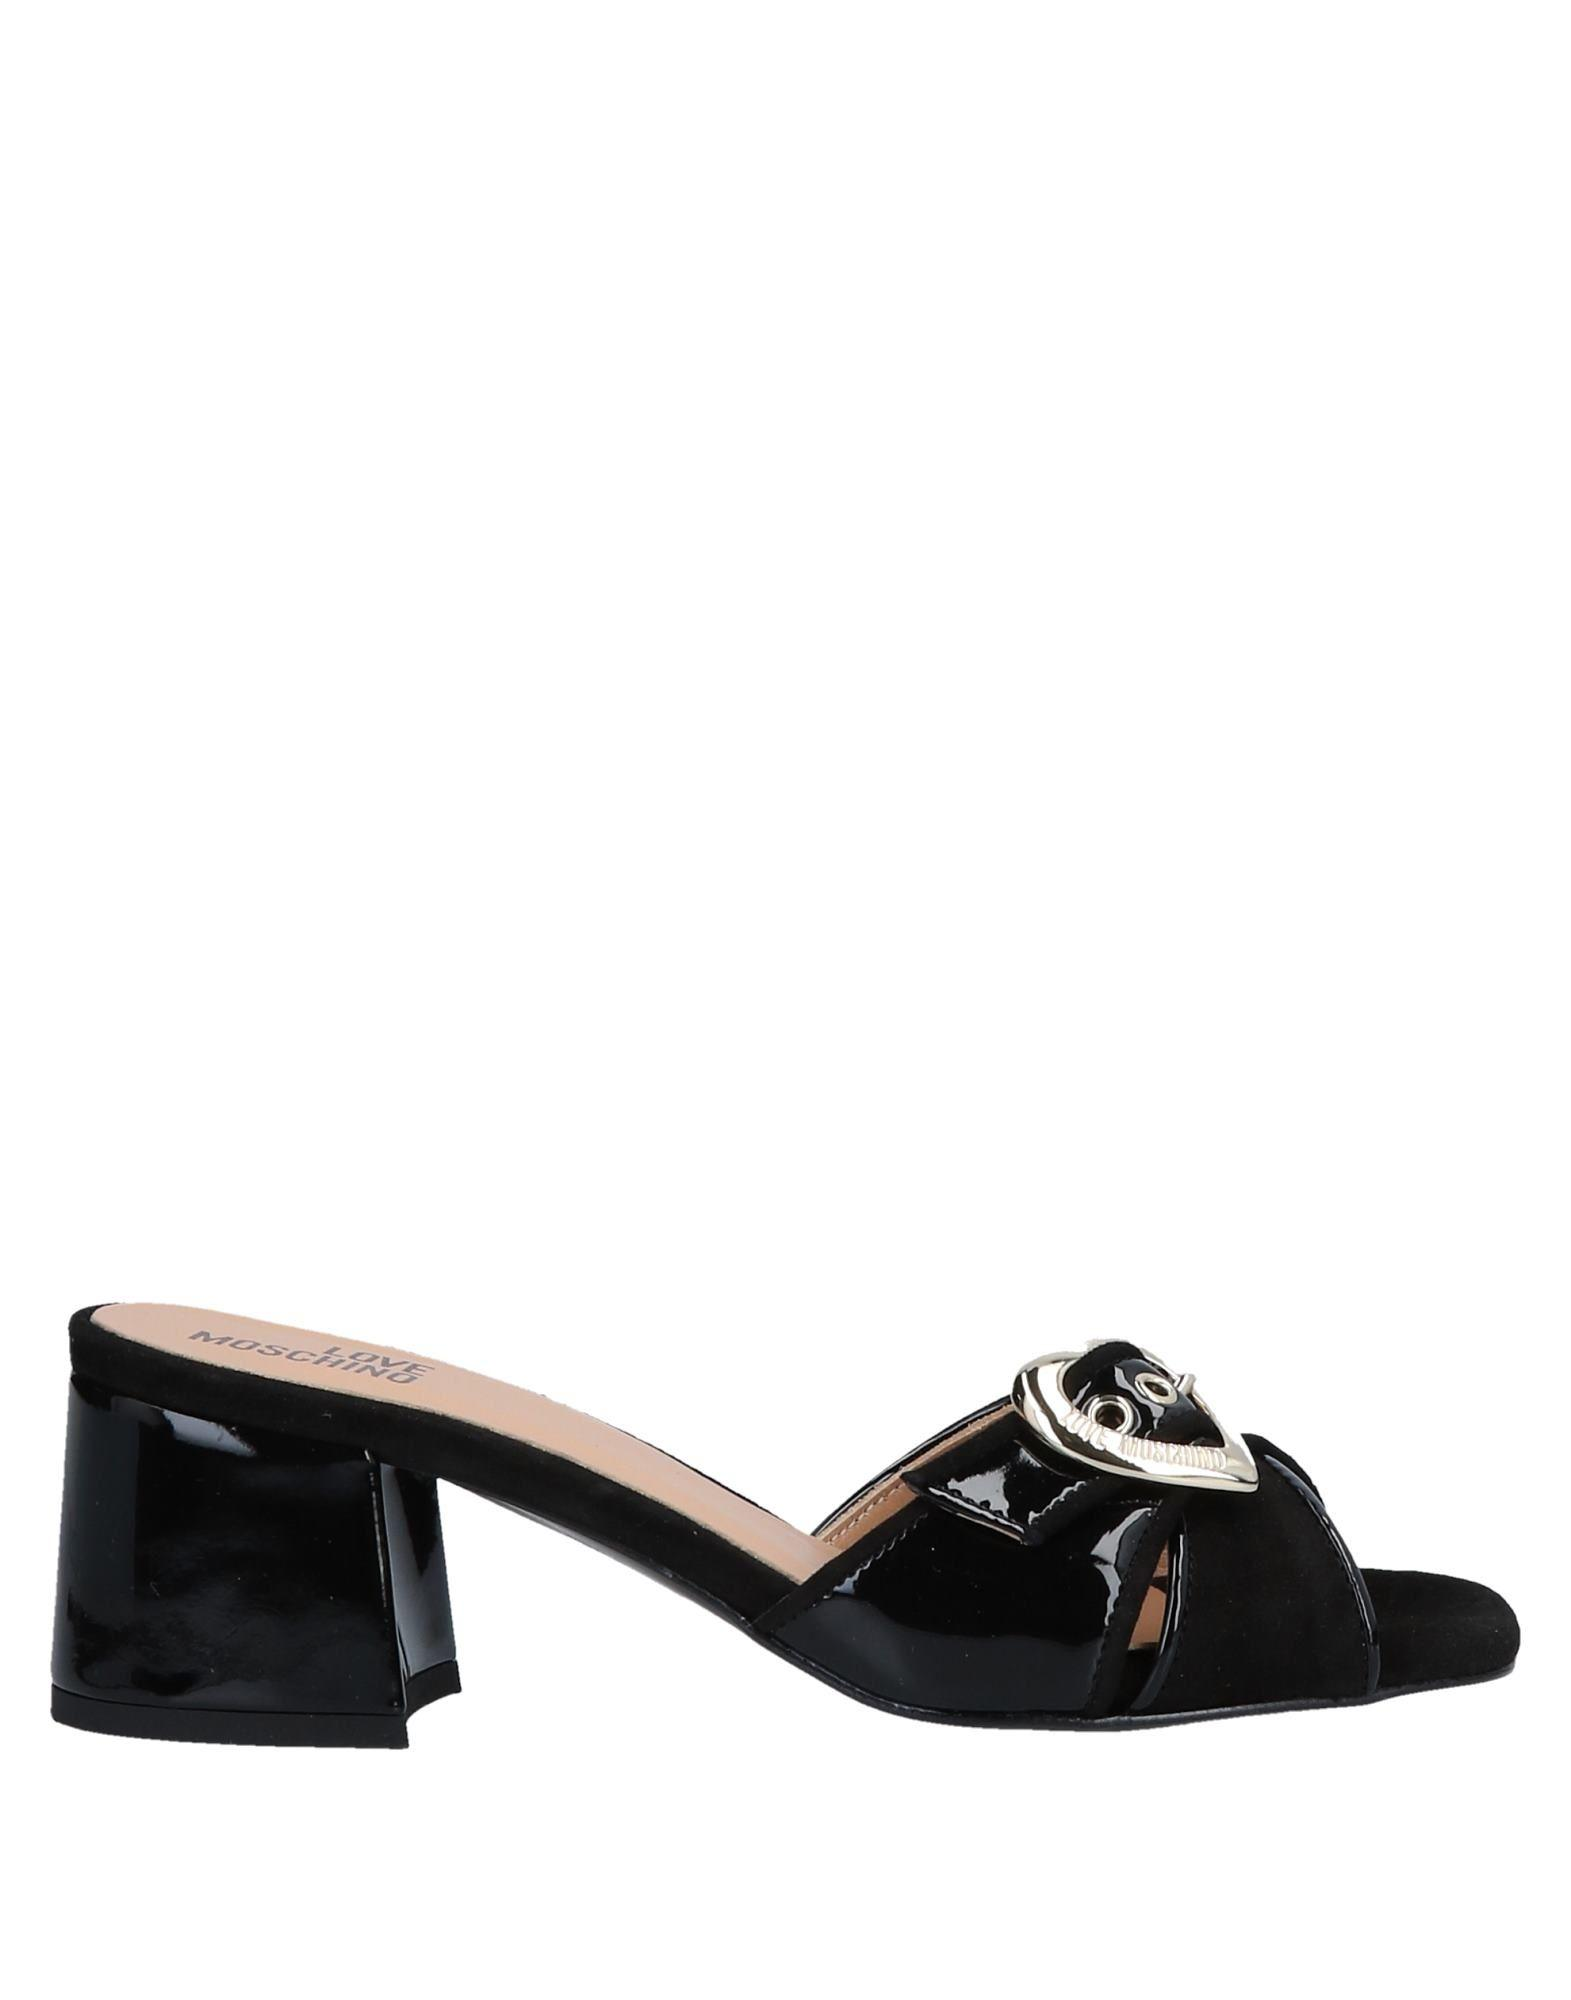 b2d50b3fca9 Lyst - Love Moschino Sandals in Black